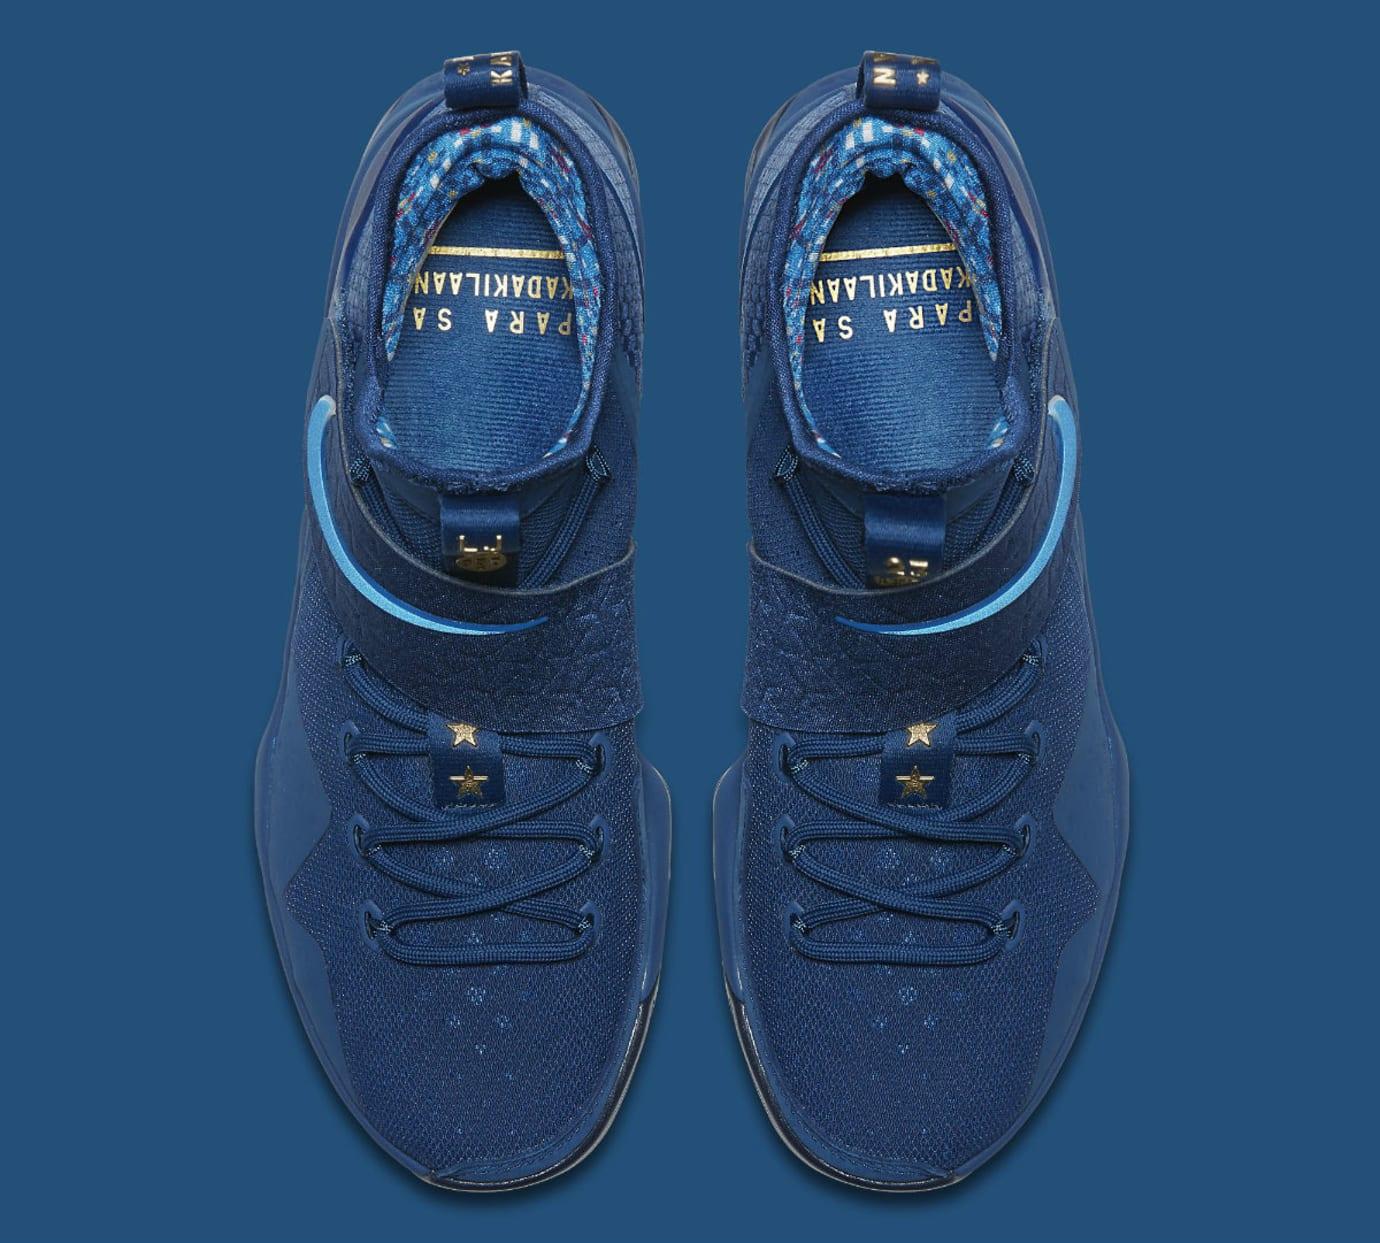 46165d8f2e47 Nike LeBron 14 Agimat U.S. Release Date Main 852402-400